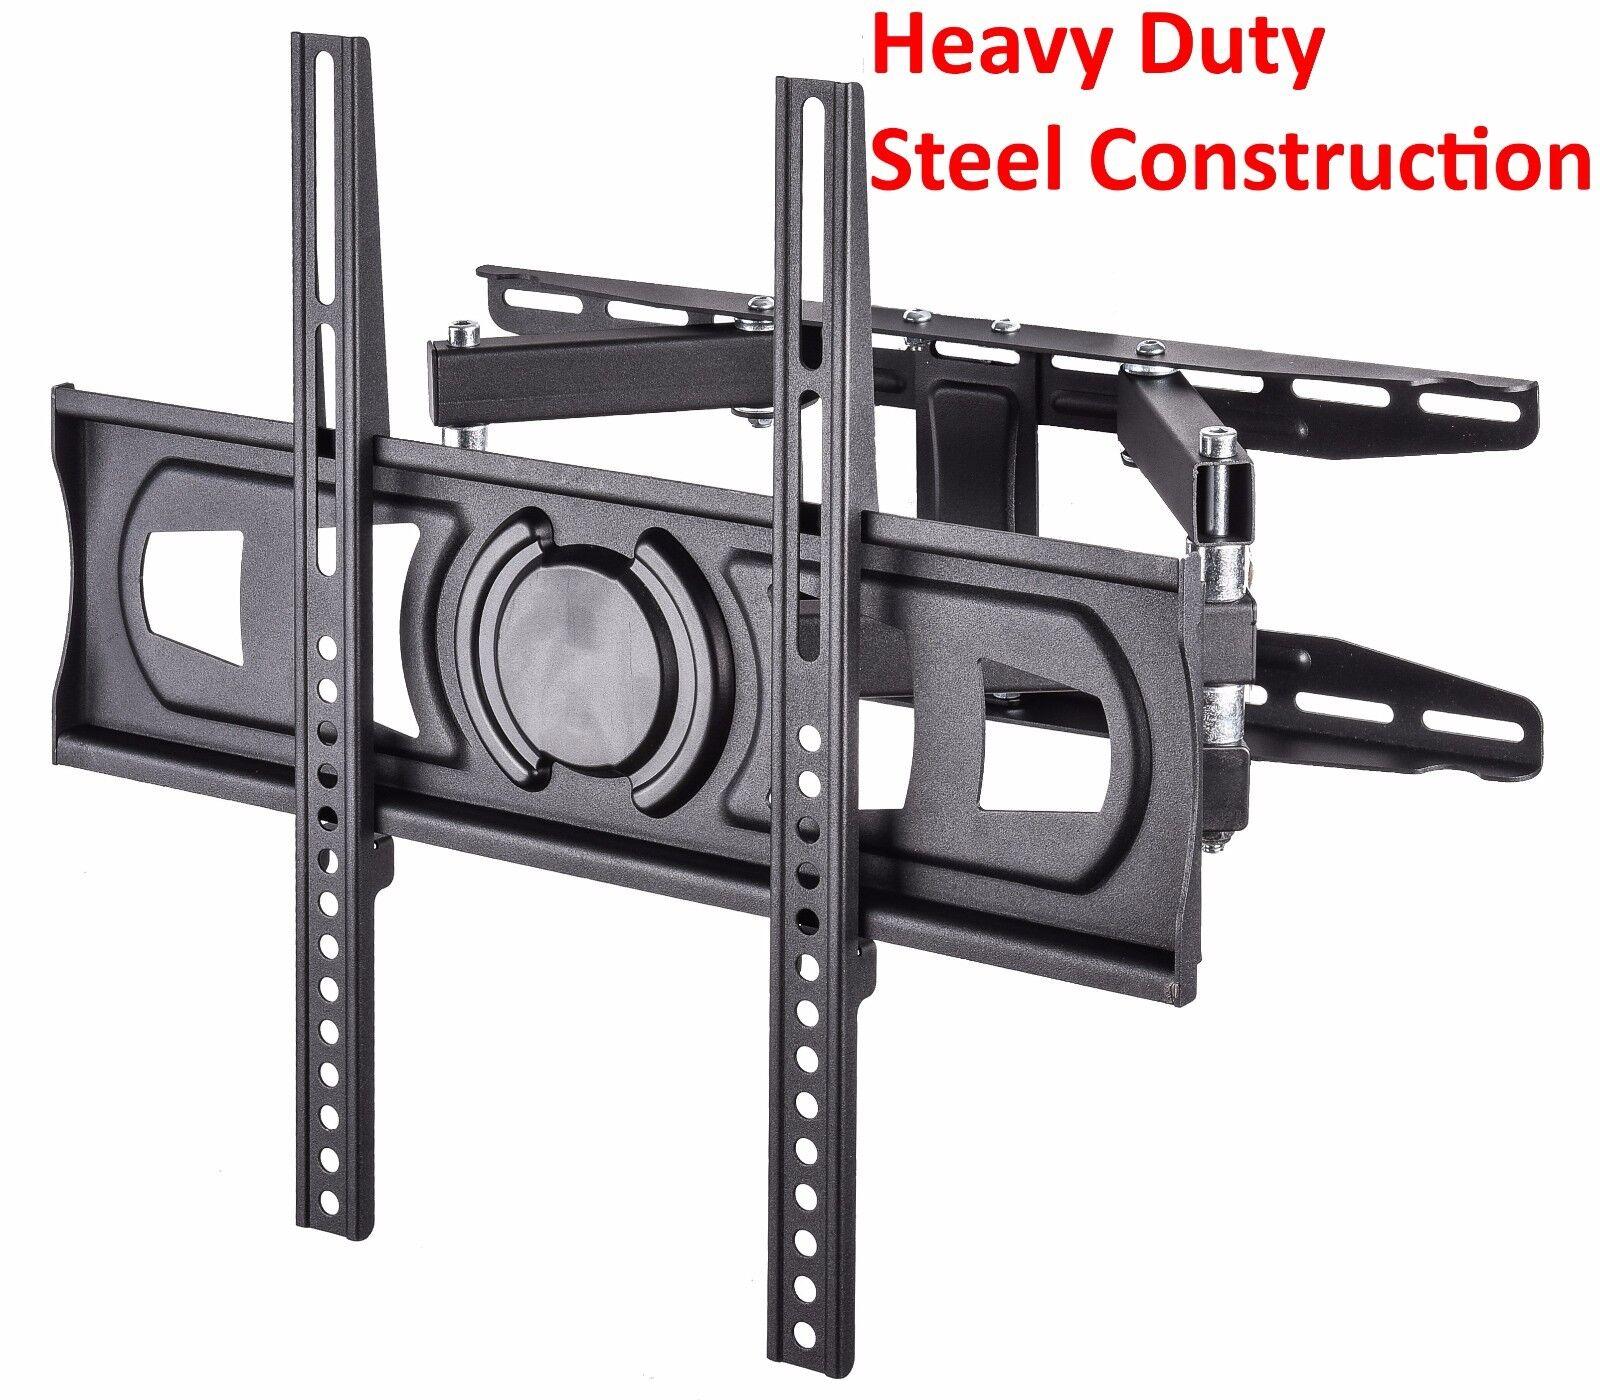 Articulating Smart TV Wall Mount Full Motion Swivel Bracket LCD LED 32-55 Inch